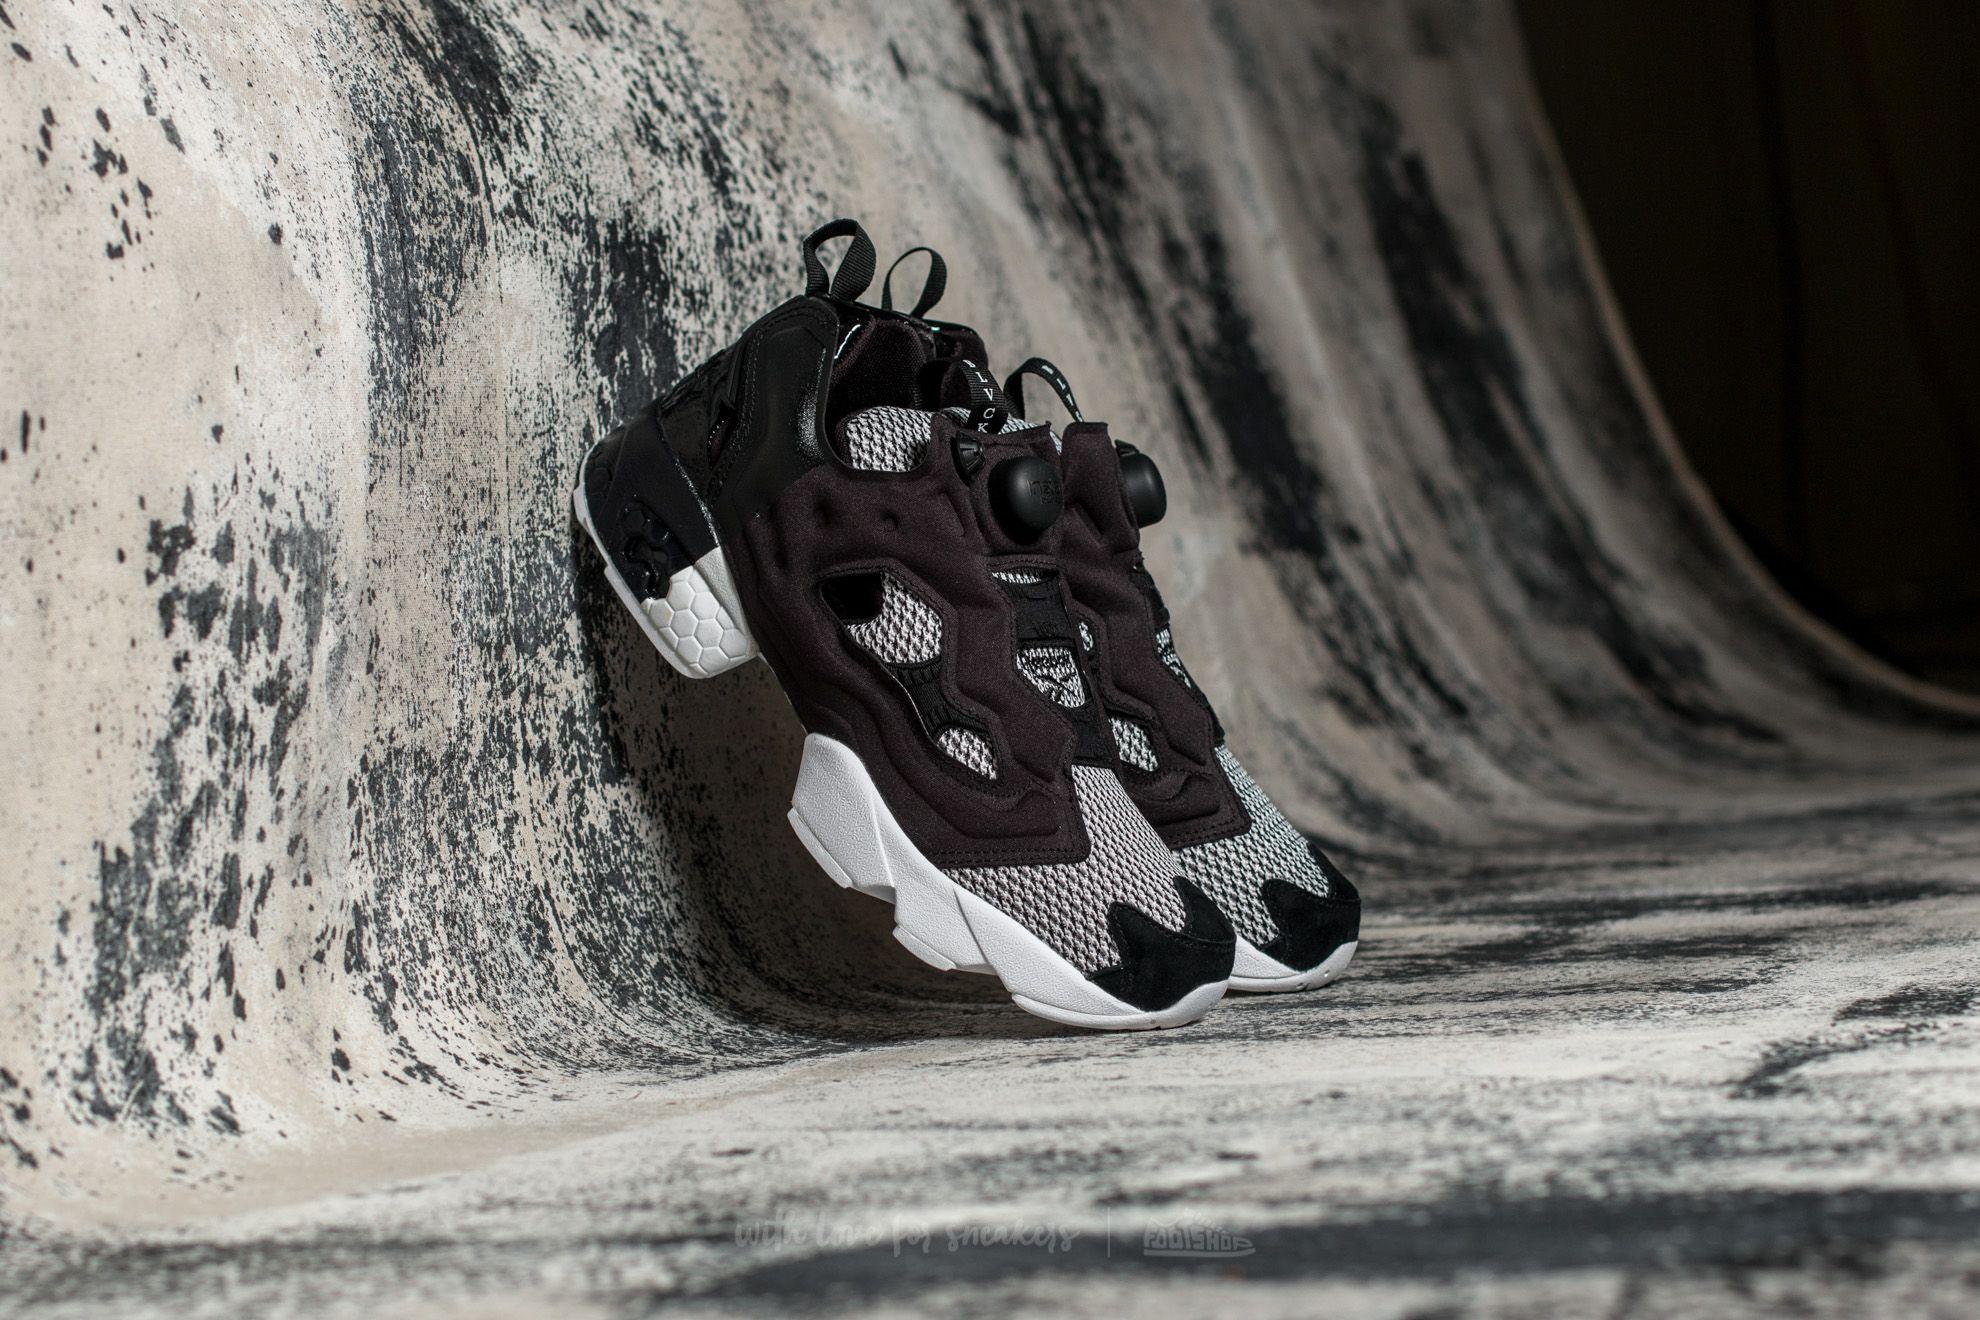 Sin alterar Consulado Gladys  Men's shoes Reebok x Black Scale Instapump Fury OG Black/ White